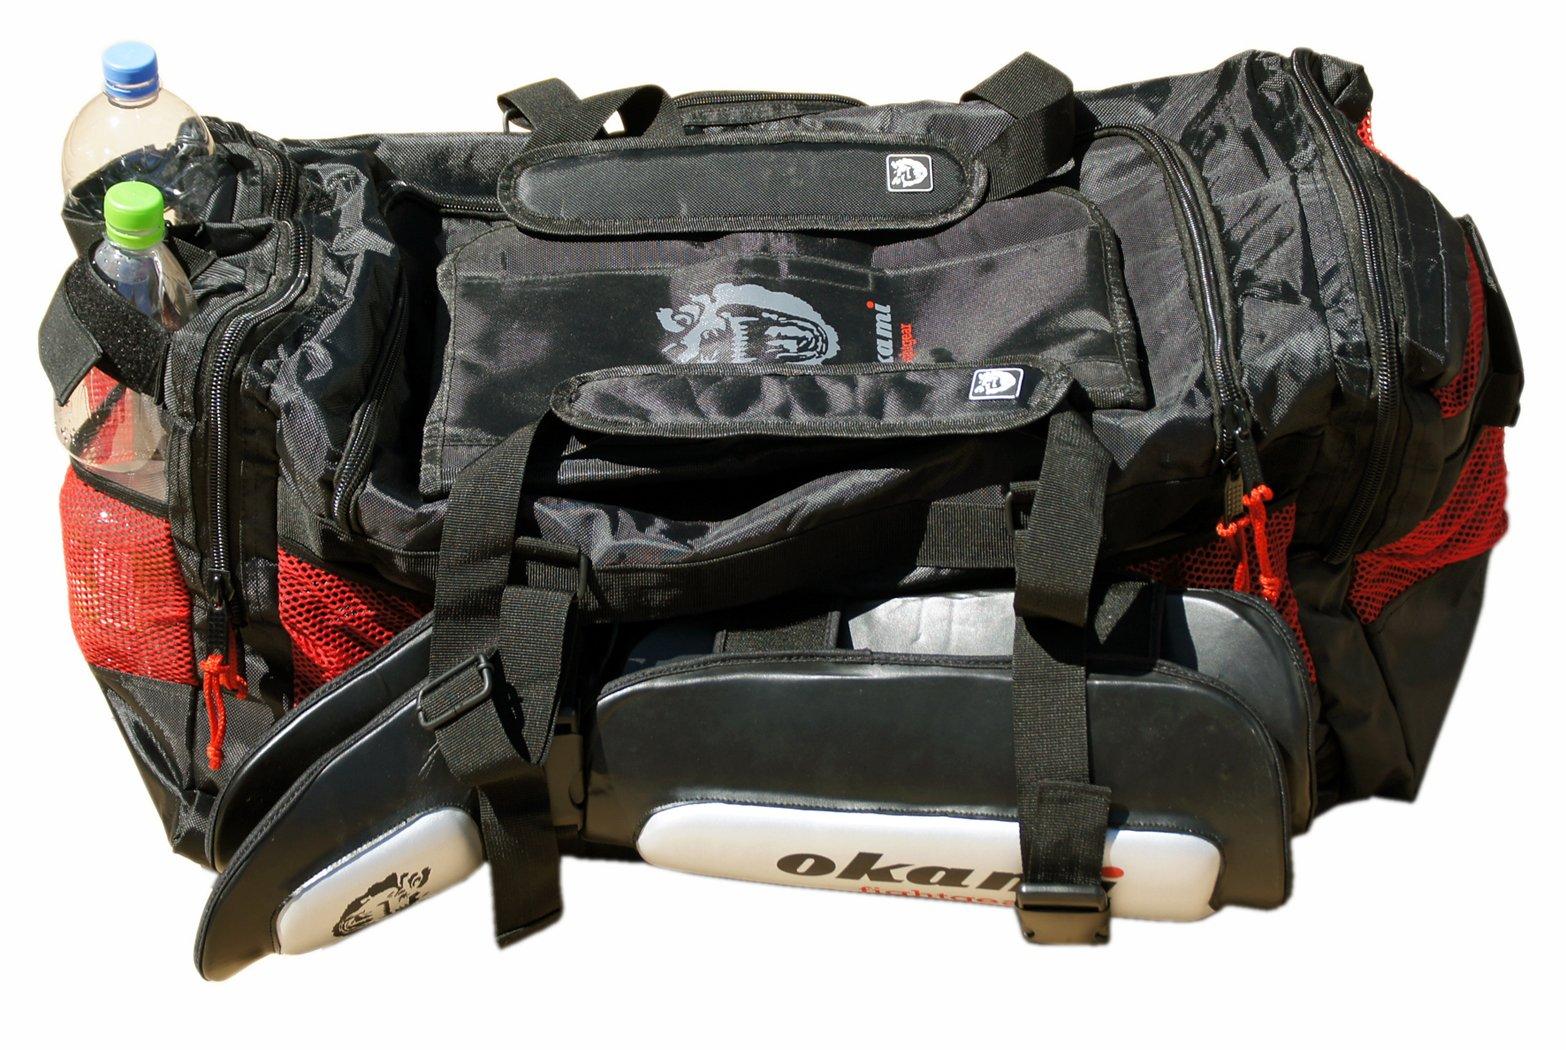 OKAMI Fight Gear Multifunctional Sports Bag - Black by OKAMI Fightgear